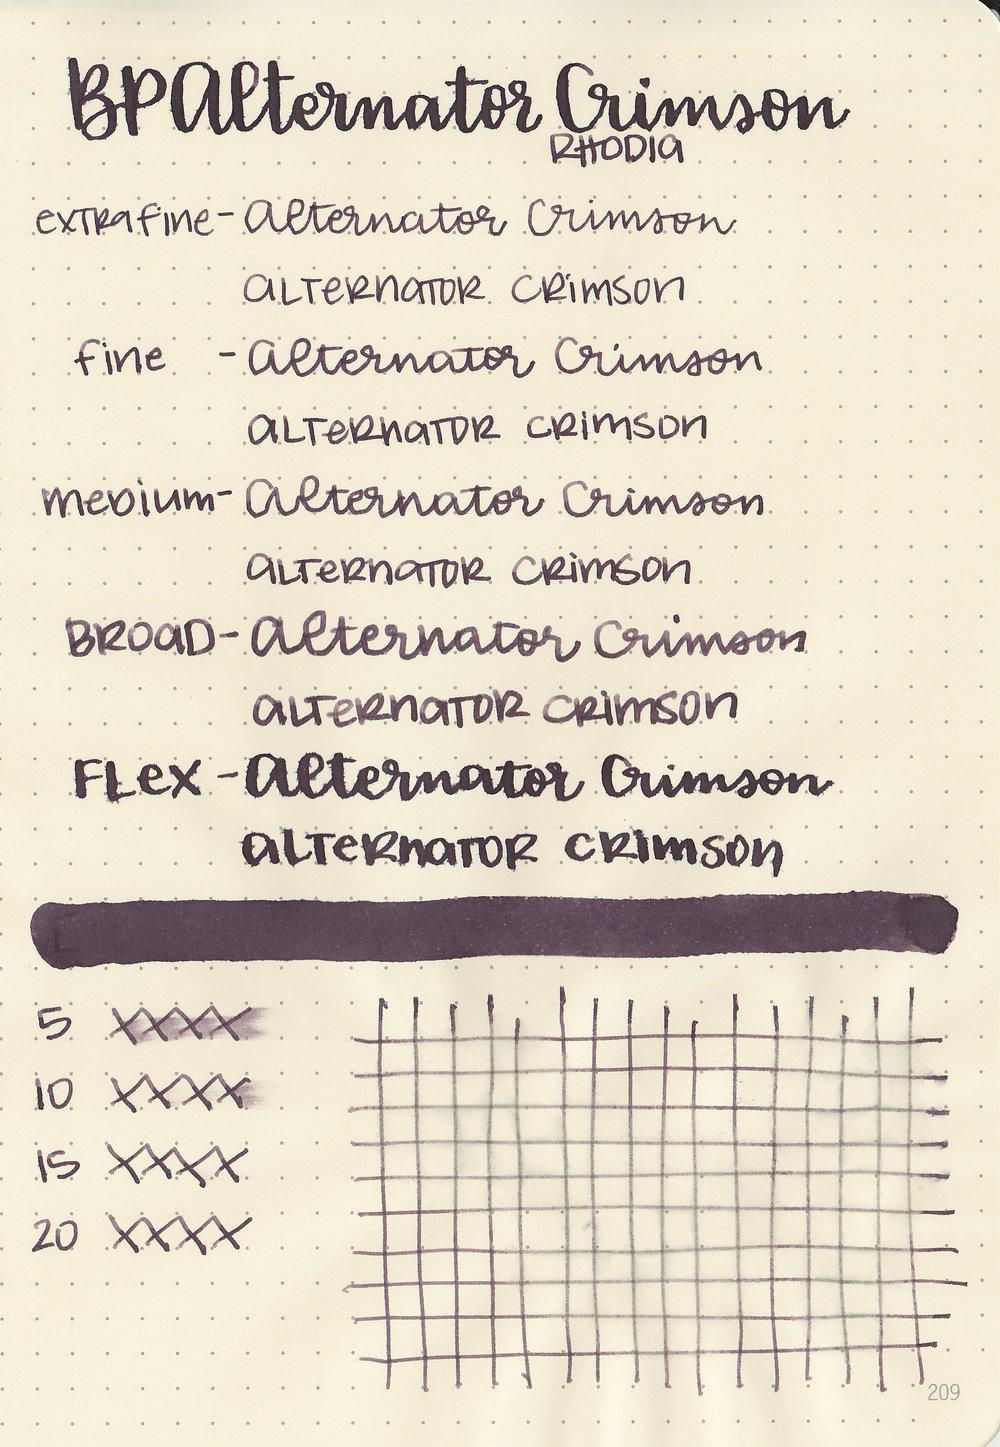 bp-alternator-crimson-7.jpg